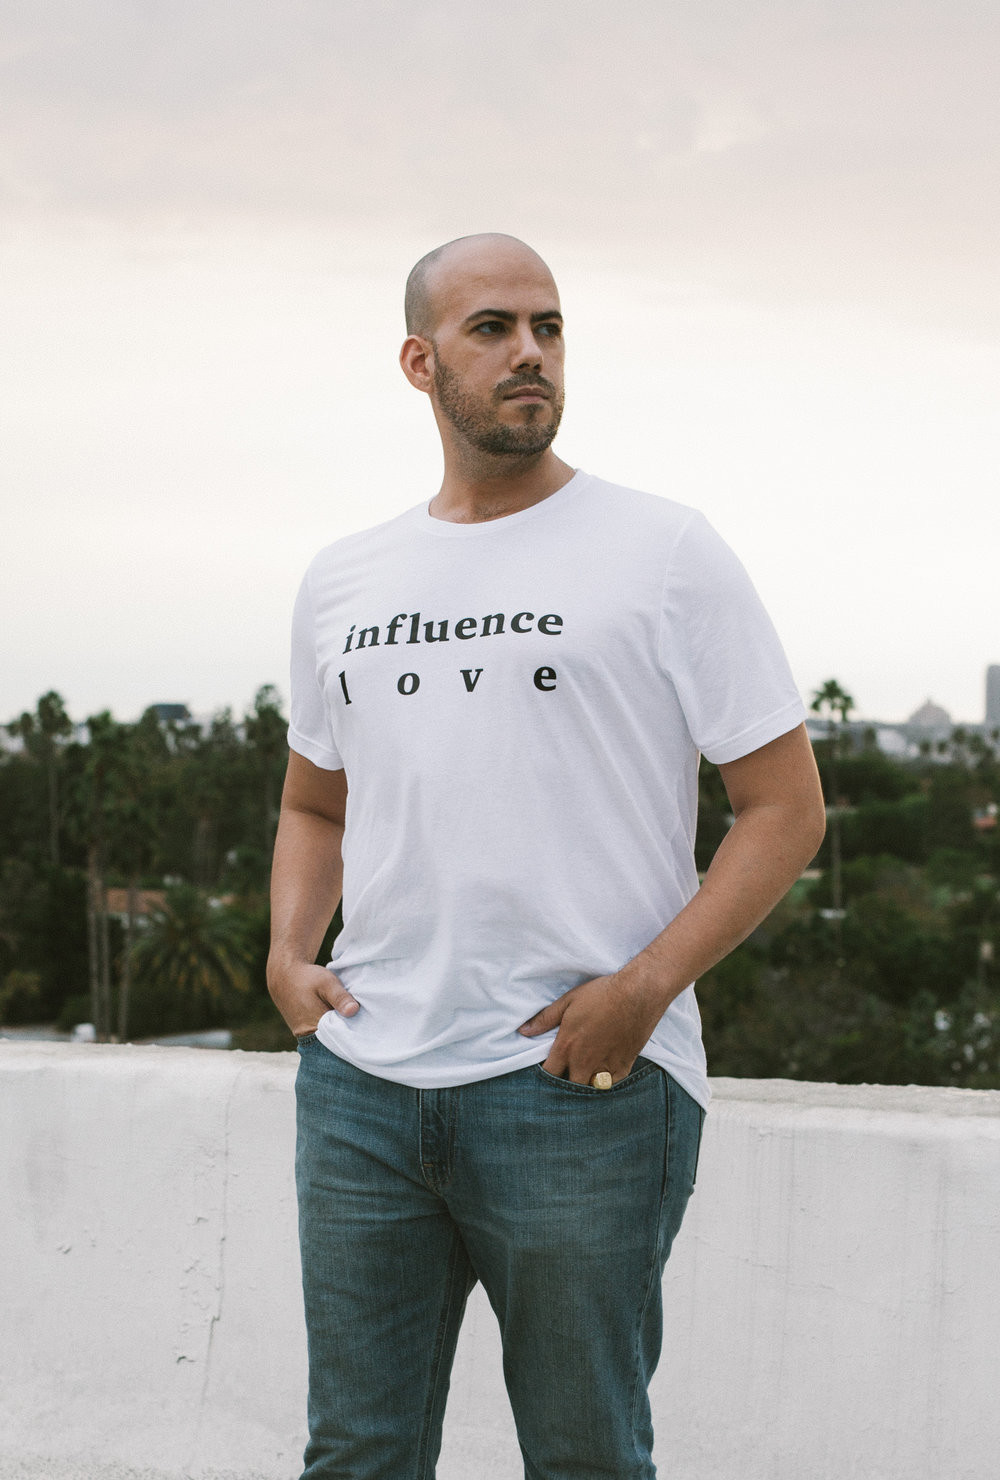 InfluenceLove Product-5x.jpg